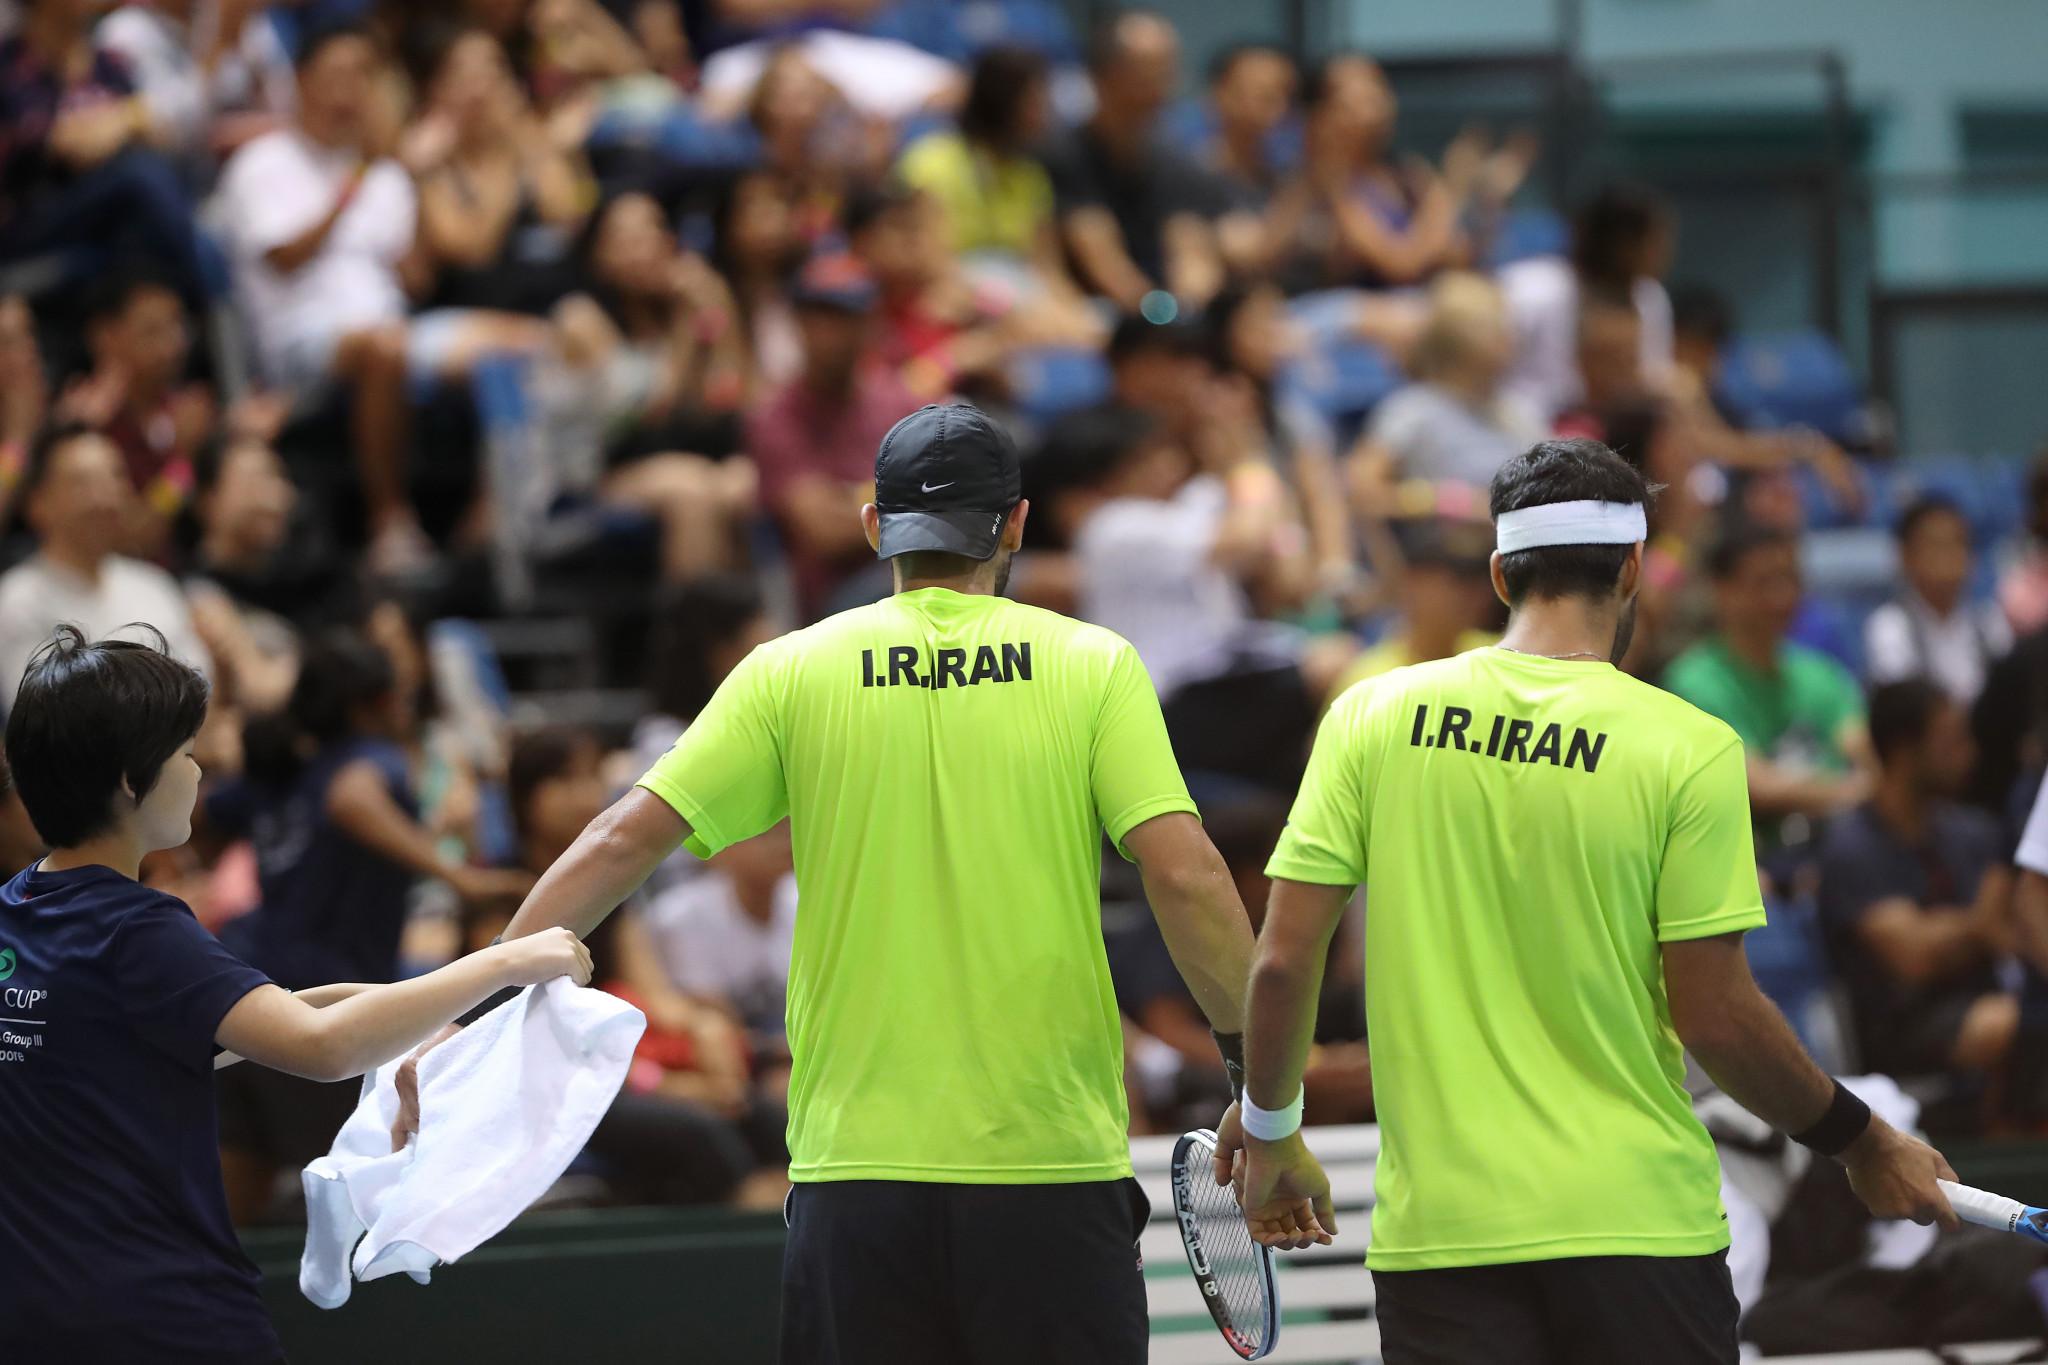 Iran Tennis Federation elects new President